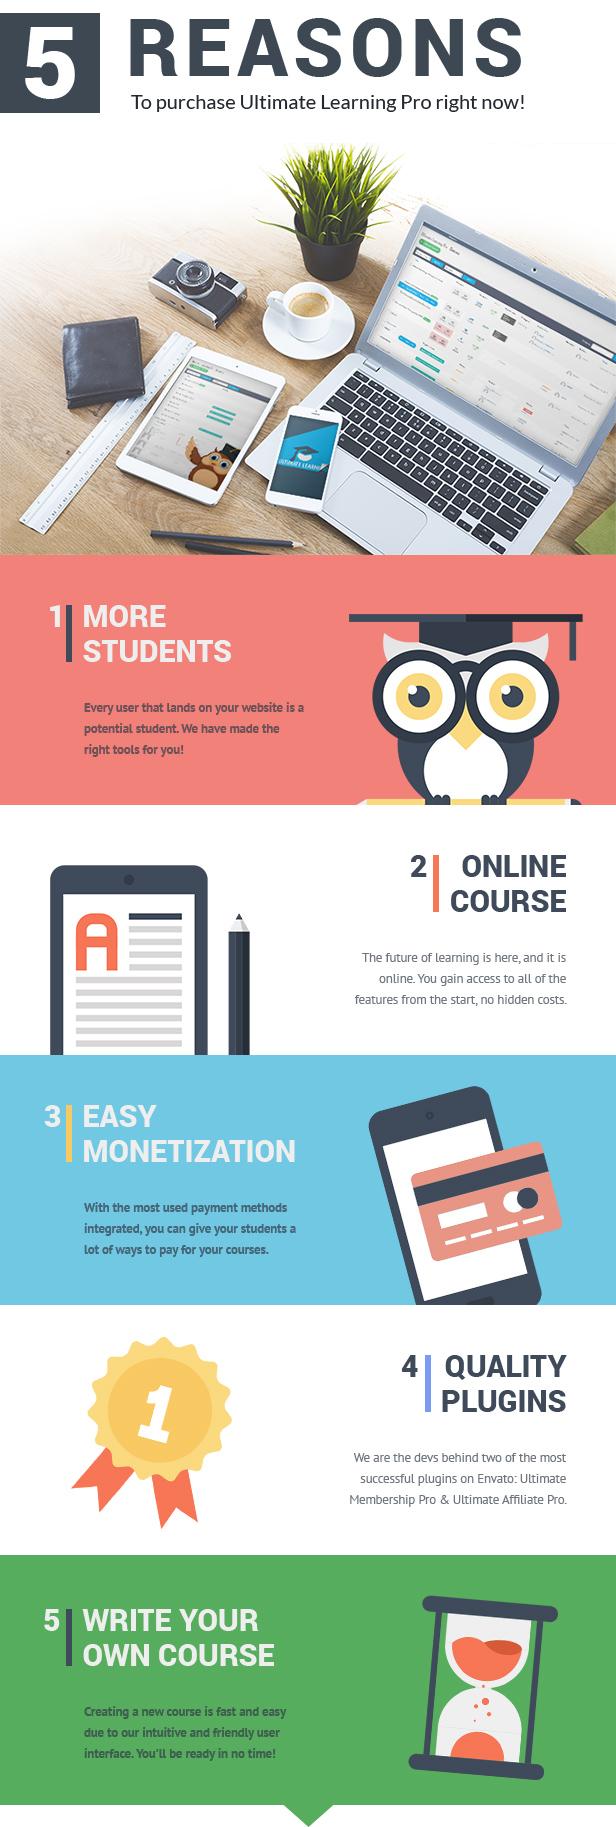 - 11 ulp 5 reasons - Ultimate Learning Pro WordPress Plugin